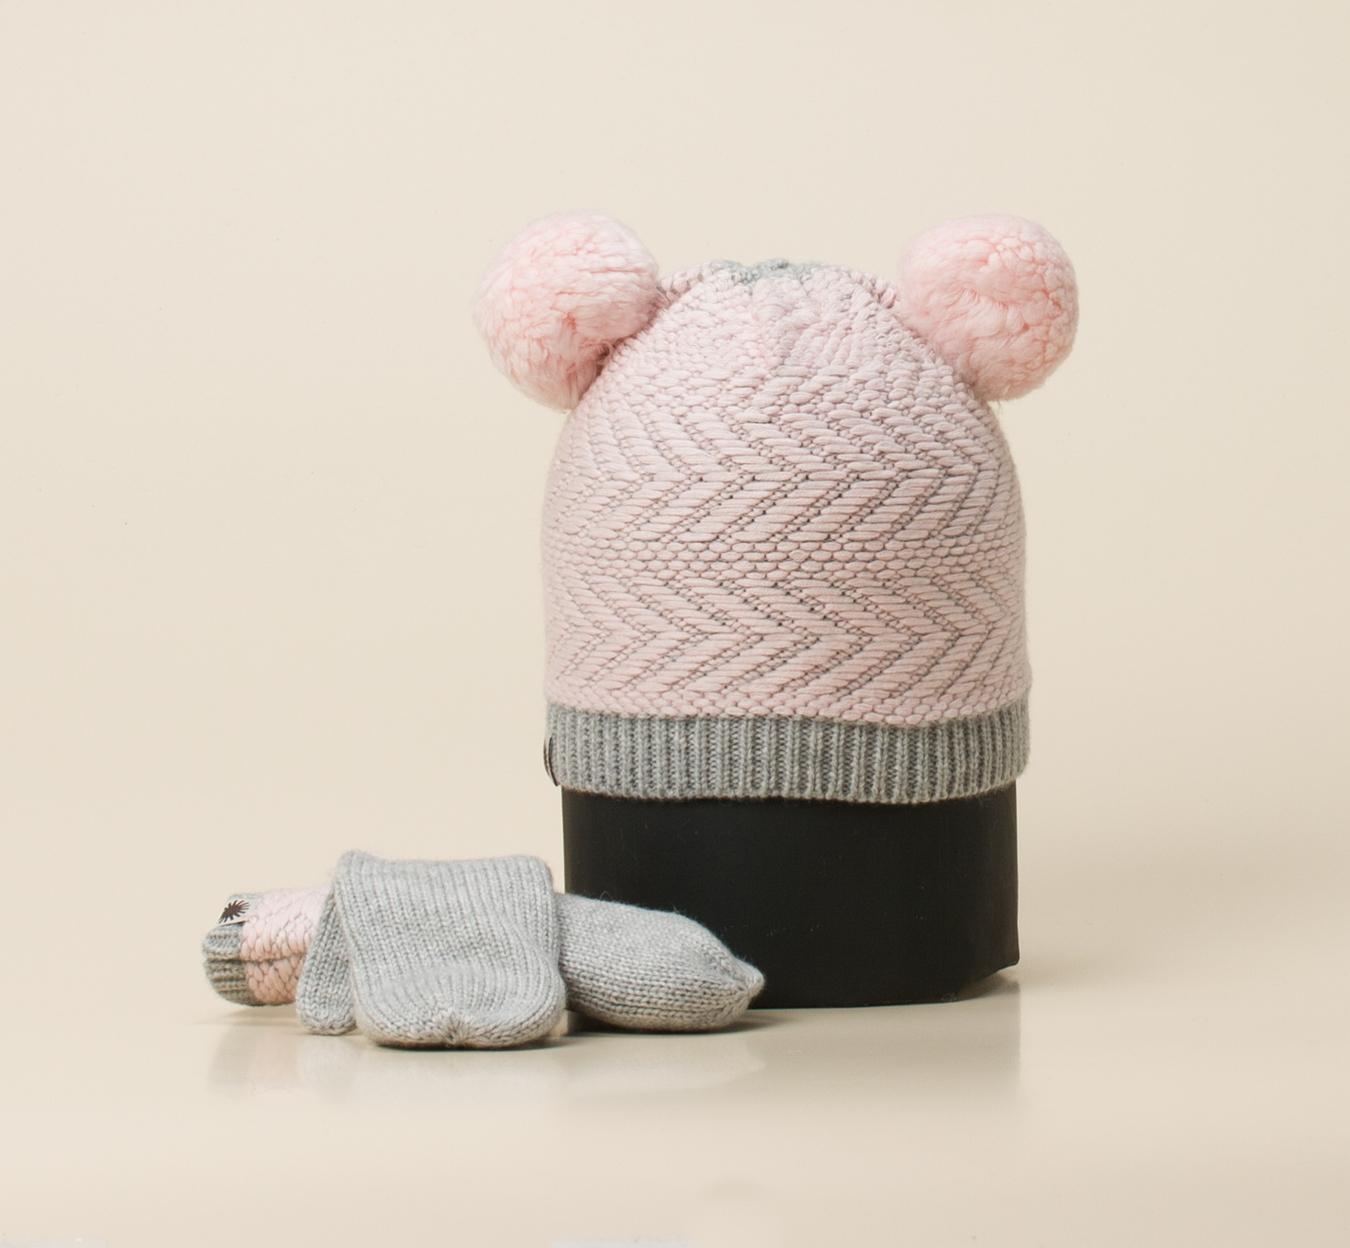 Kindermode, Schuhe und Access (kindernacces) on Pinterest